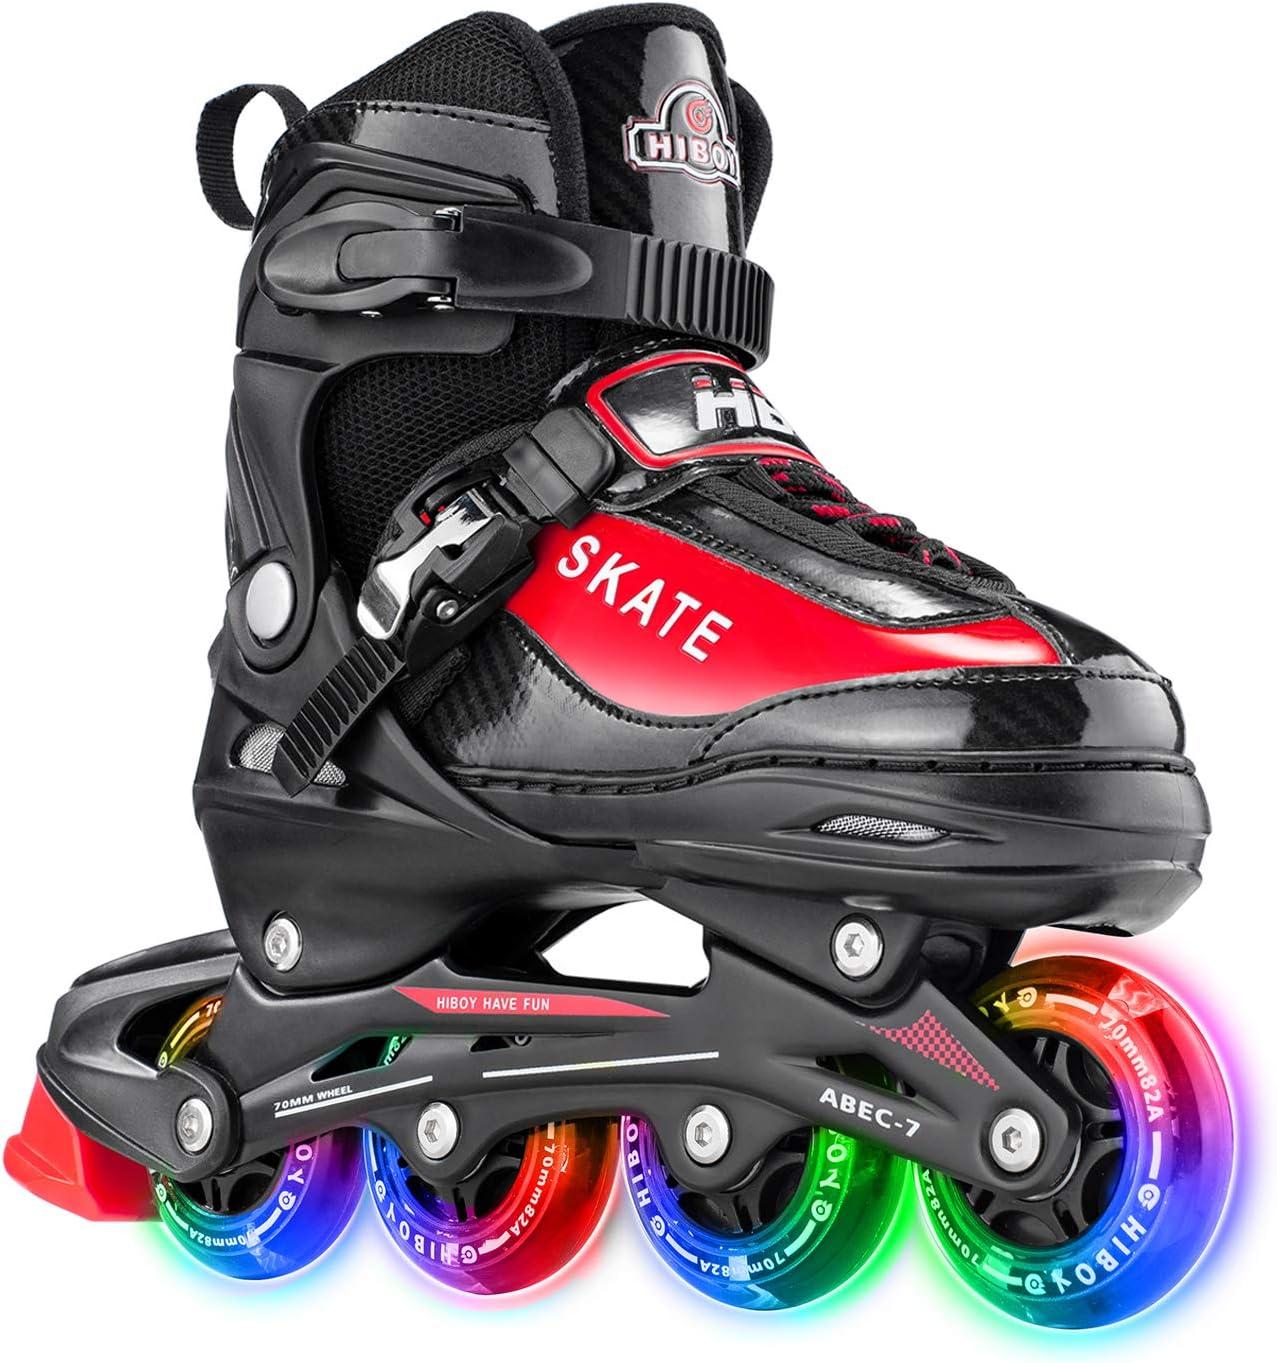 Girls Outdoor /& Indoor Illuminating Roller Skates for Boys Hiboy Adjustable Inline Skates with All Light up Wheels Beginners